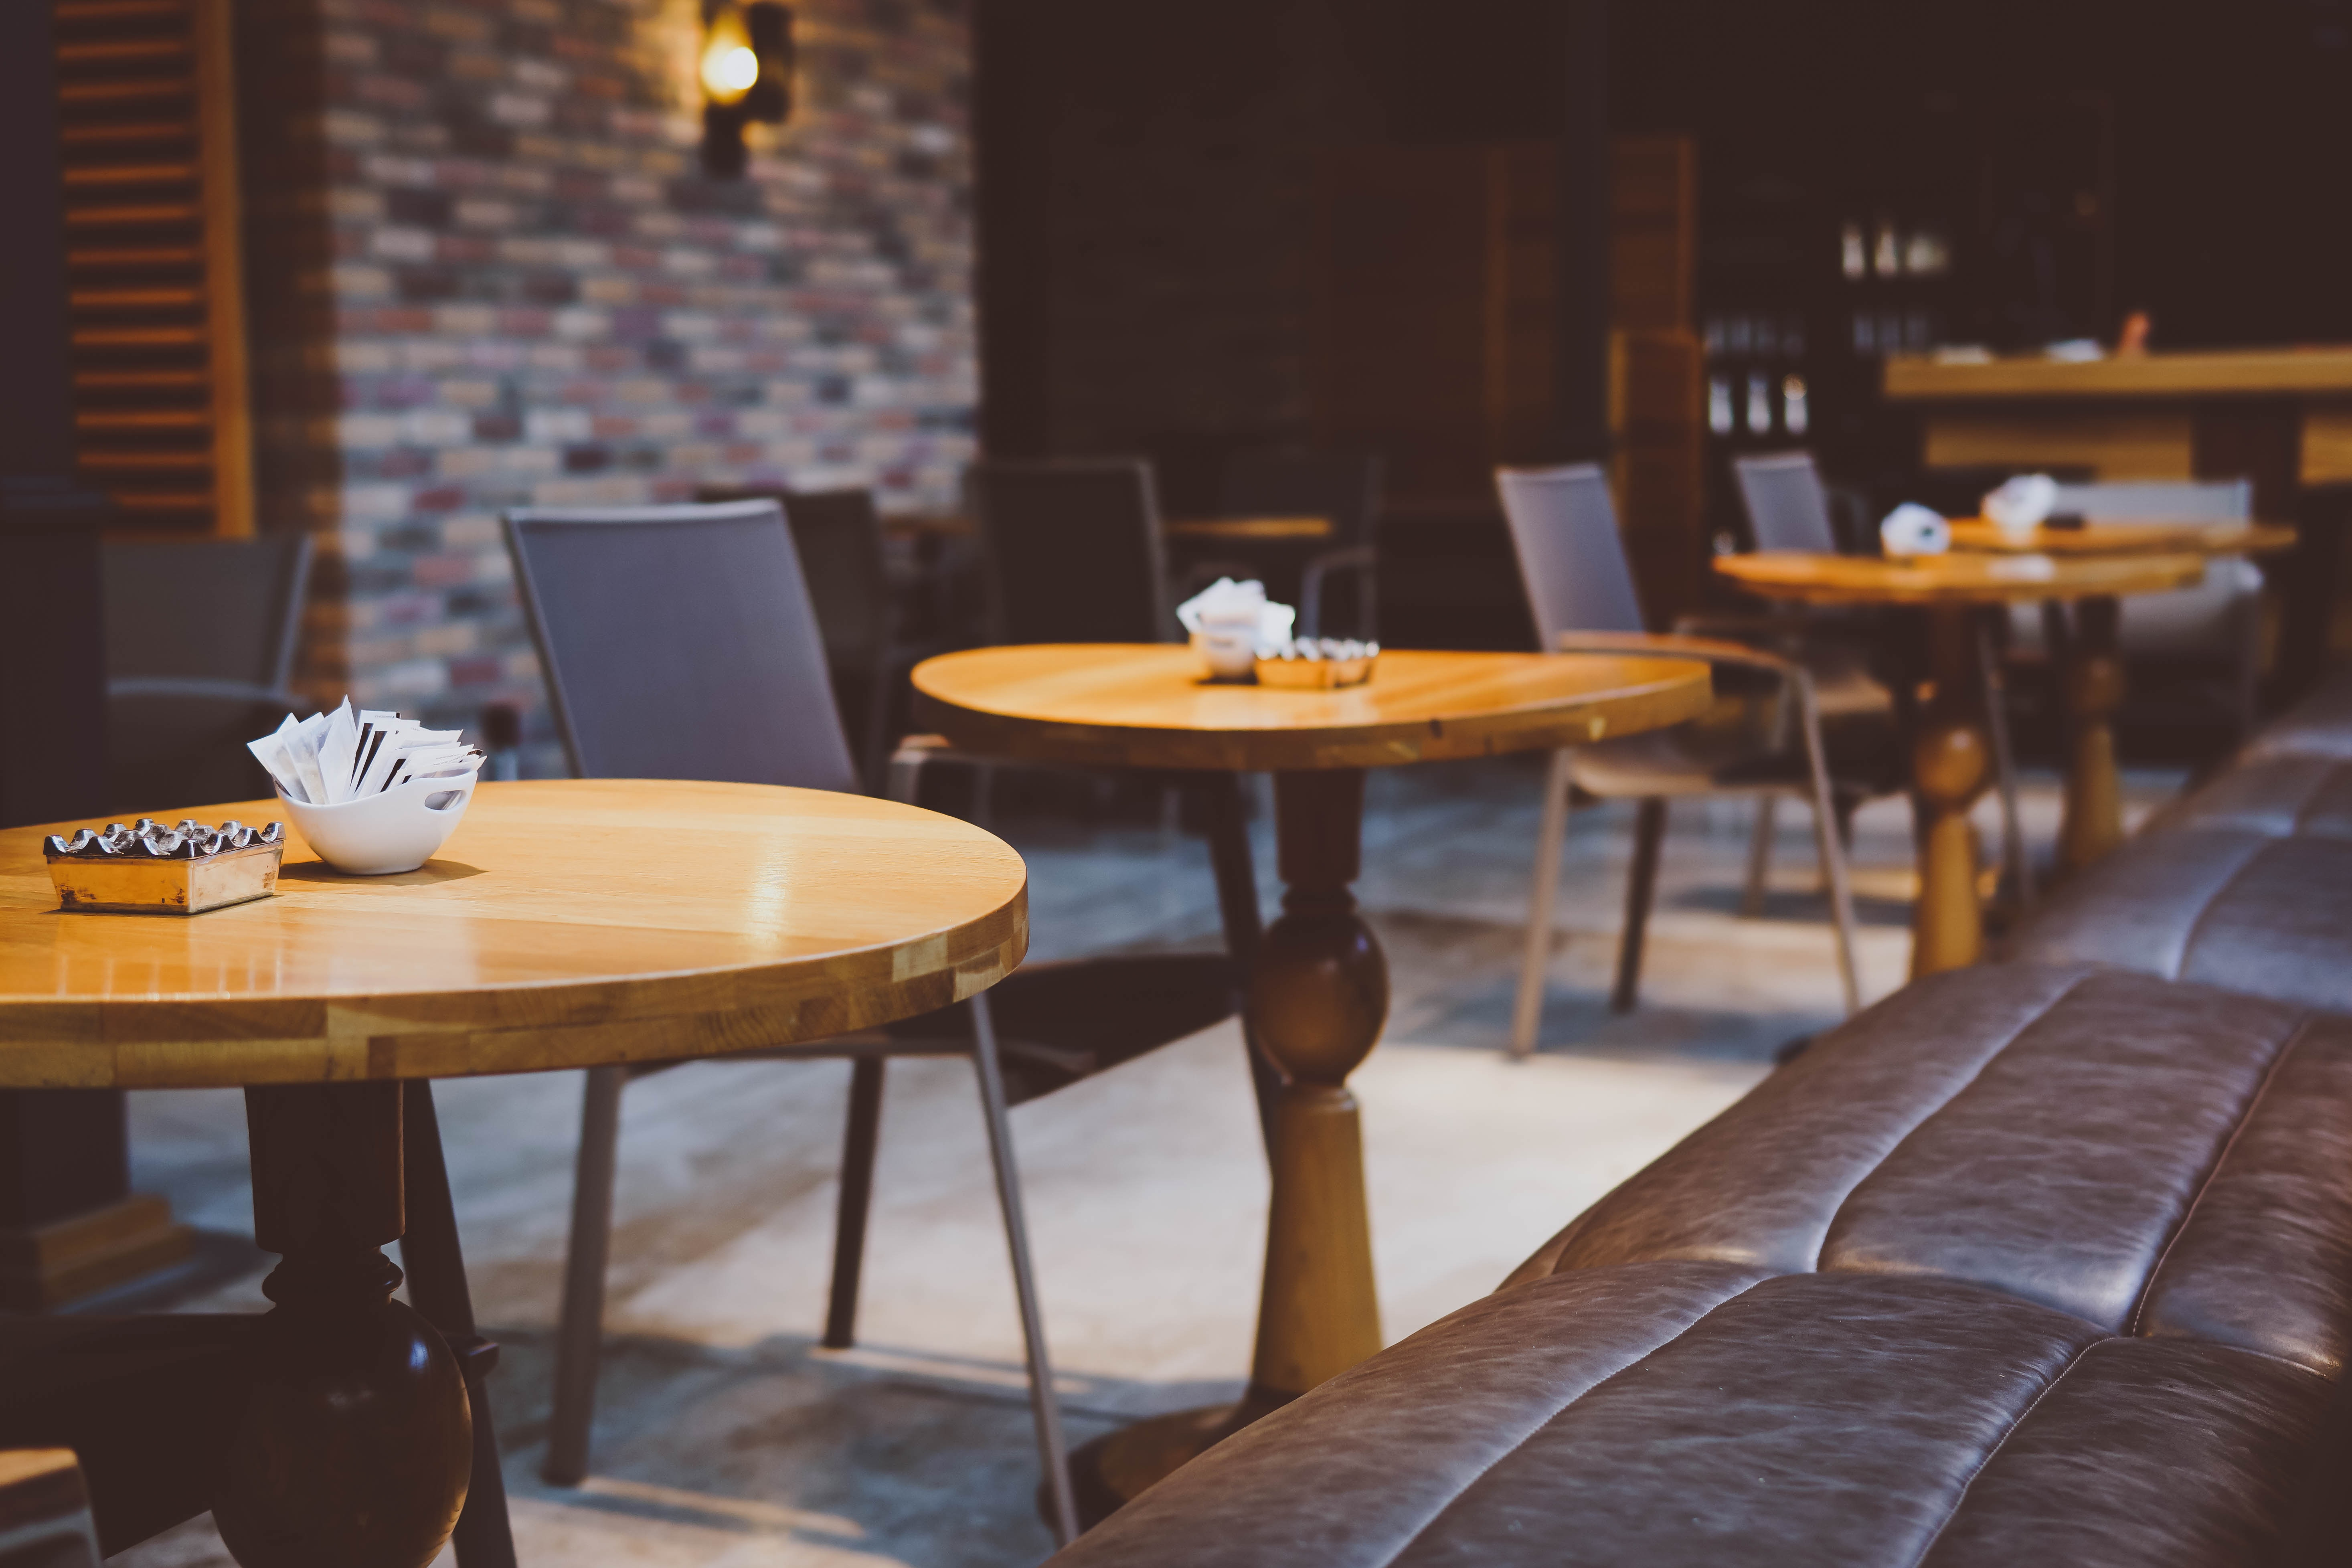 Restaurant finance image 6